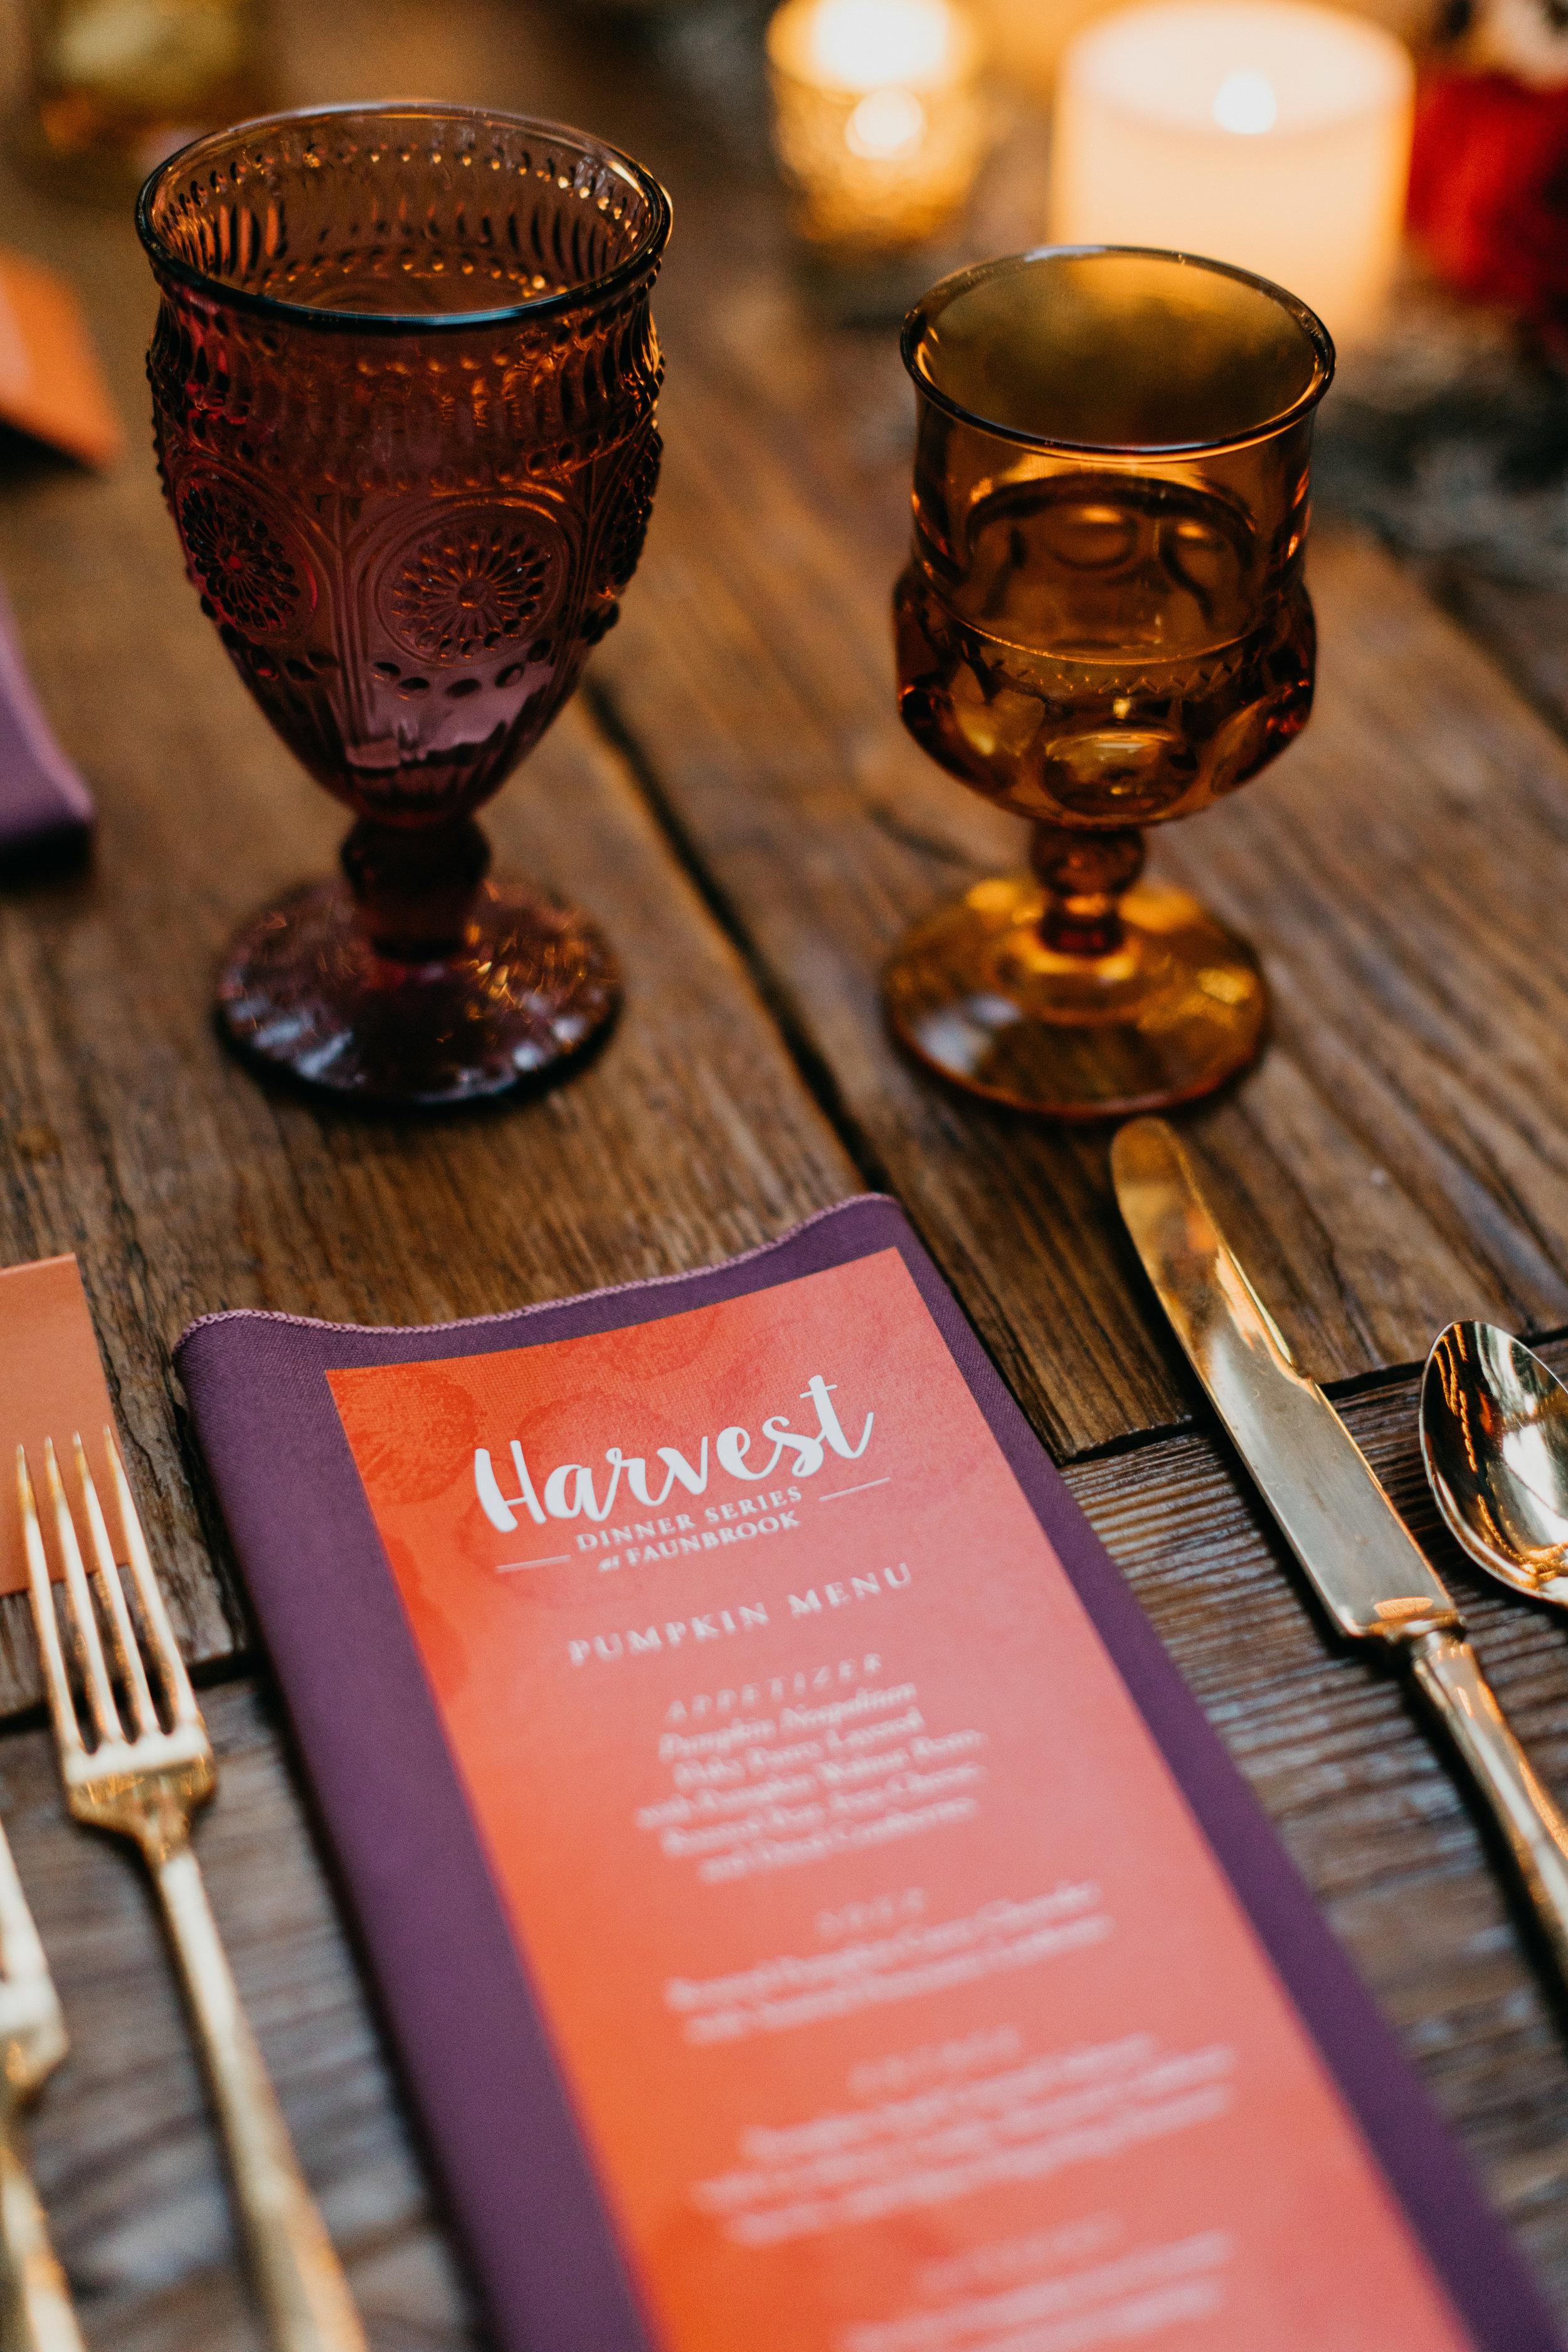 West-Chester-PA-Faunbrook-Harvest-Dinner-Series-Pumpkin-JustinJohnson-89.jpg